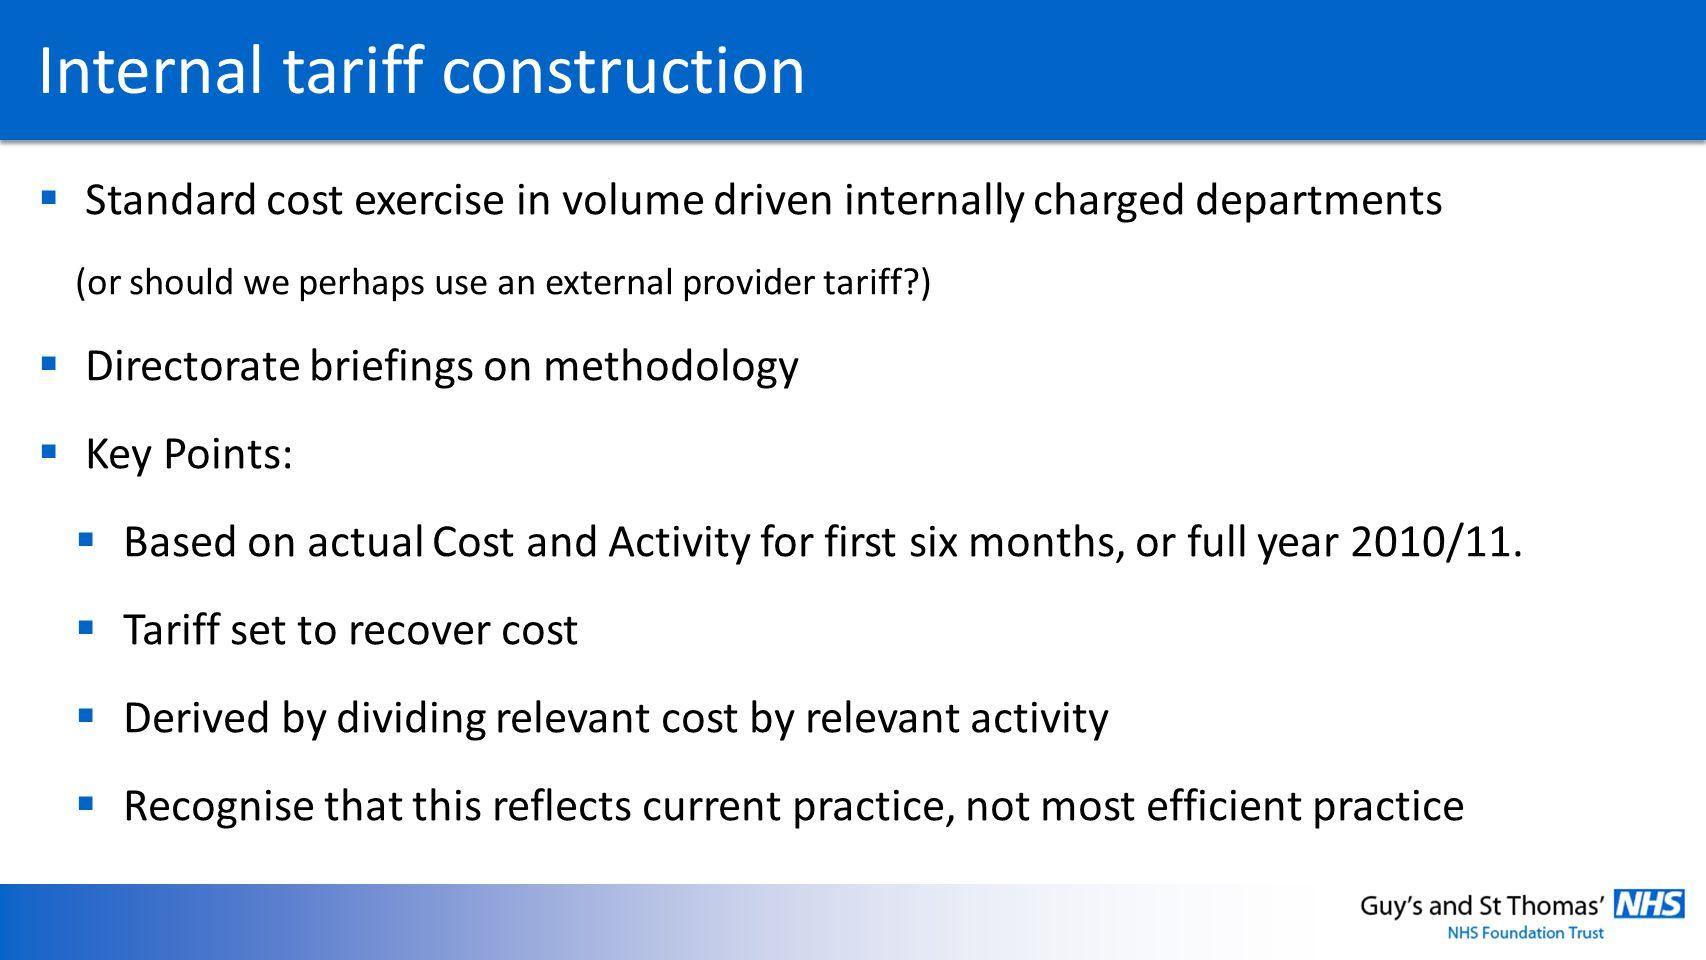 Internal tariff construction